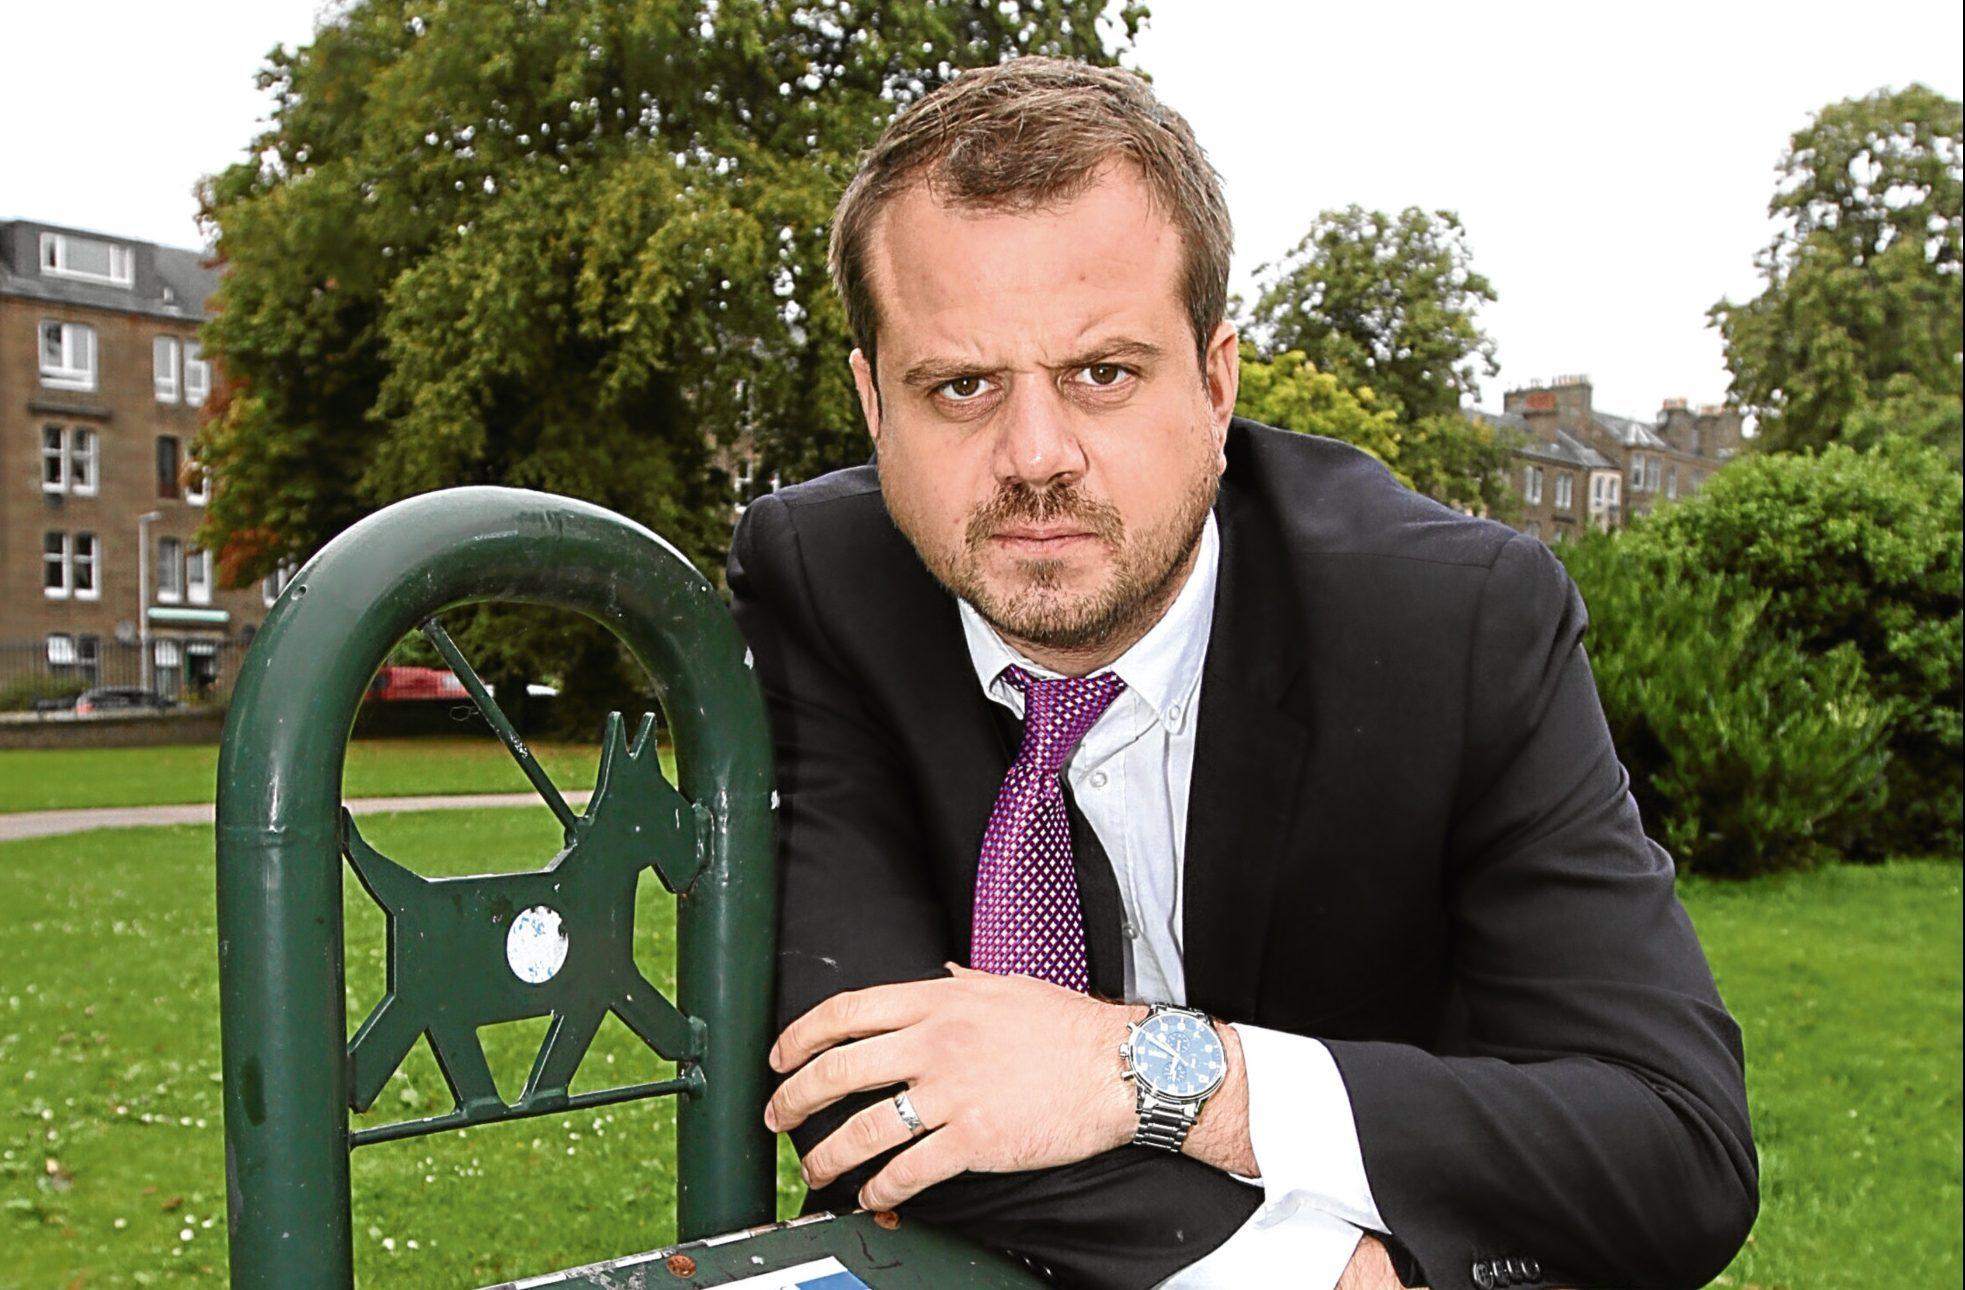 Craig Melville